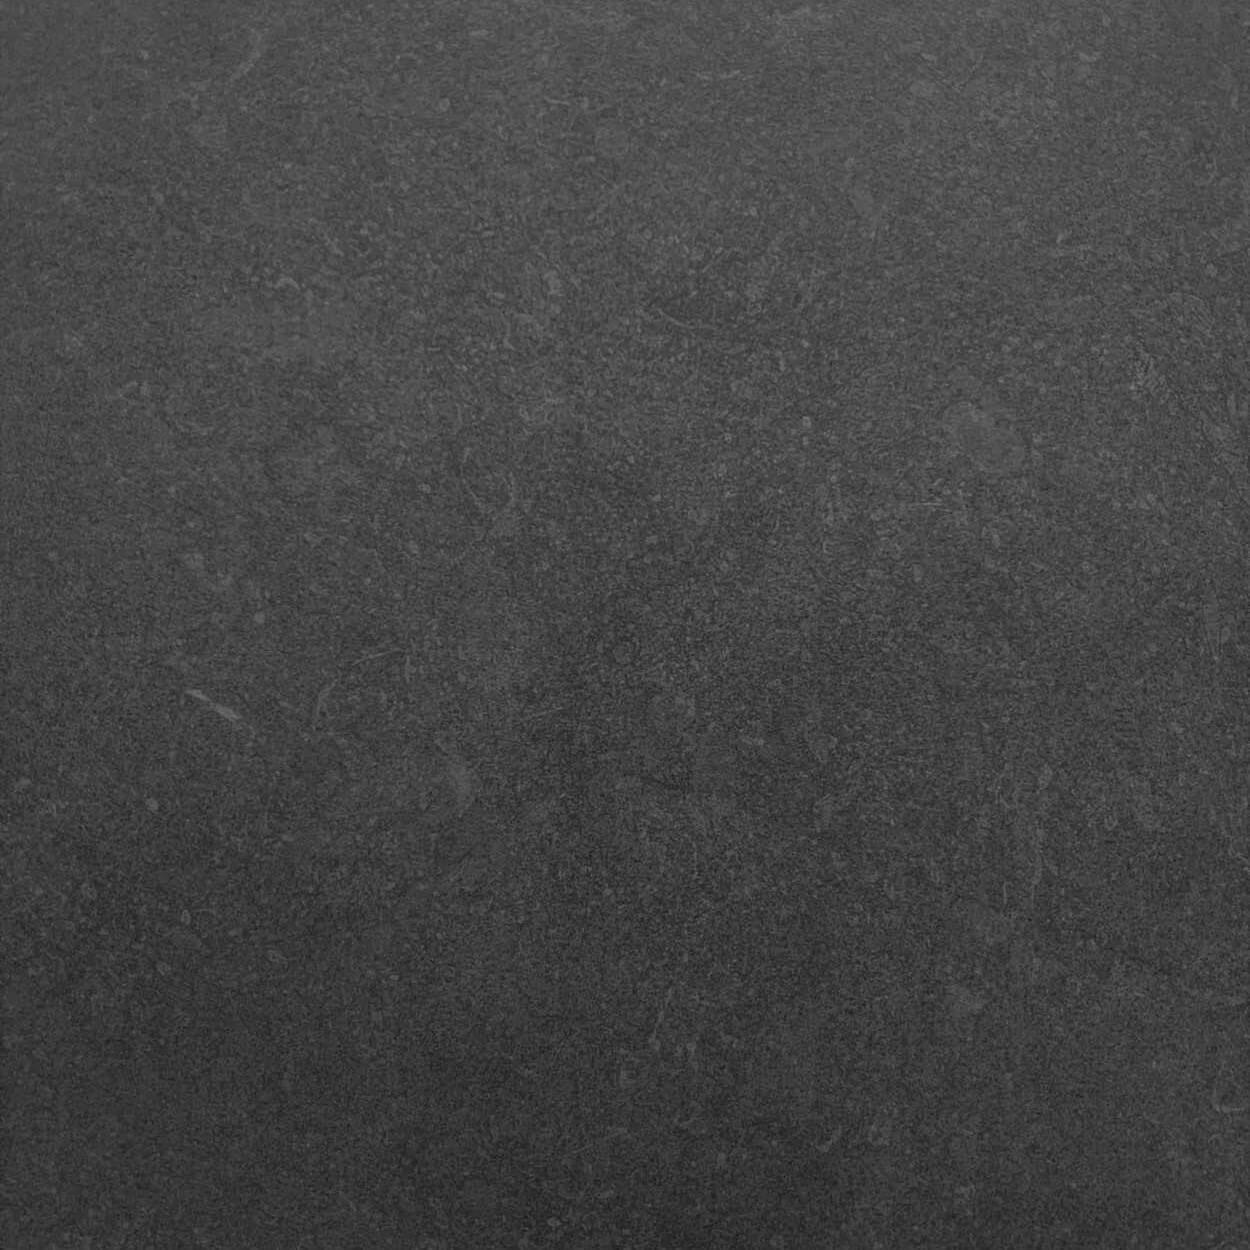 Charcoal Matt Non Rectified Porcelain Tile 3430